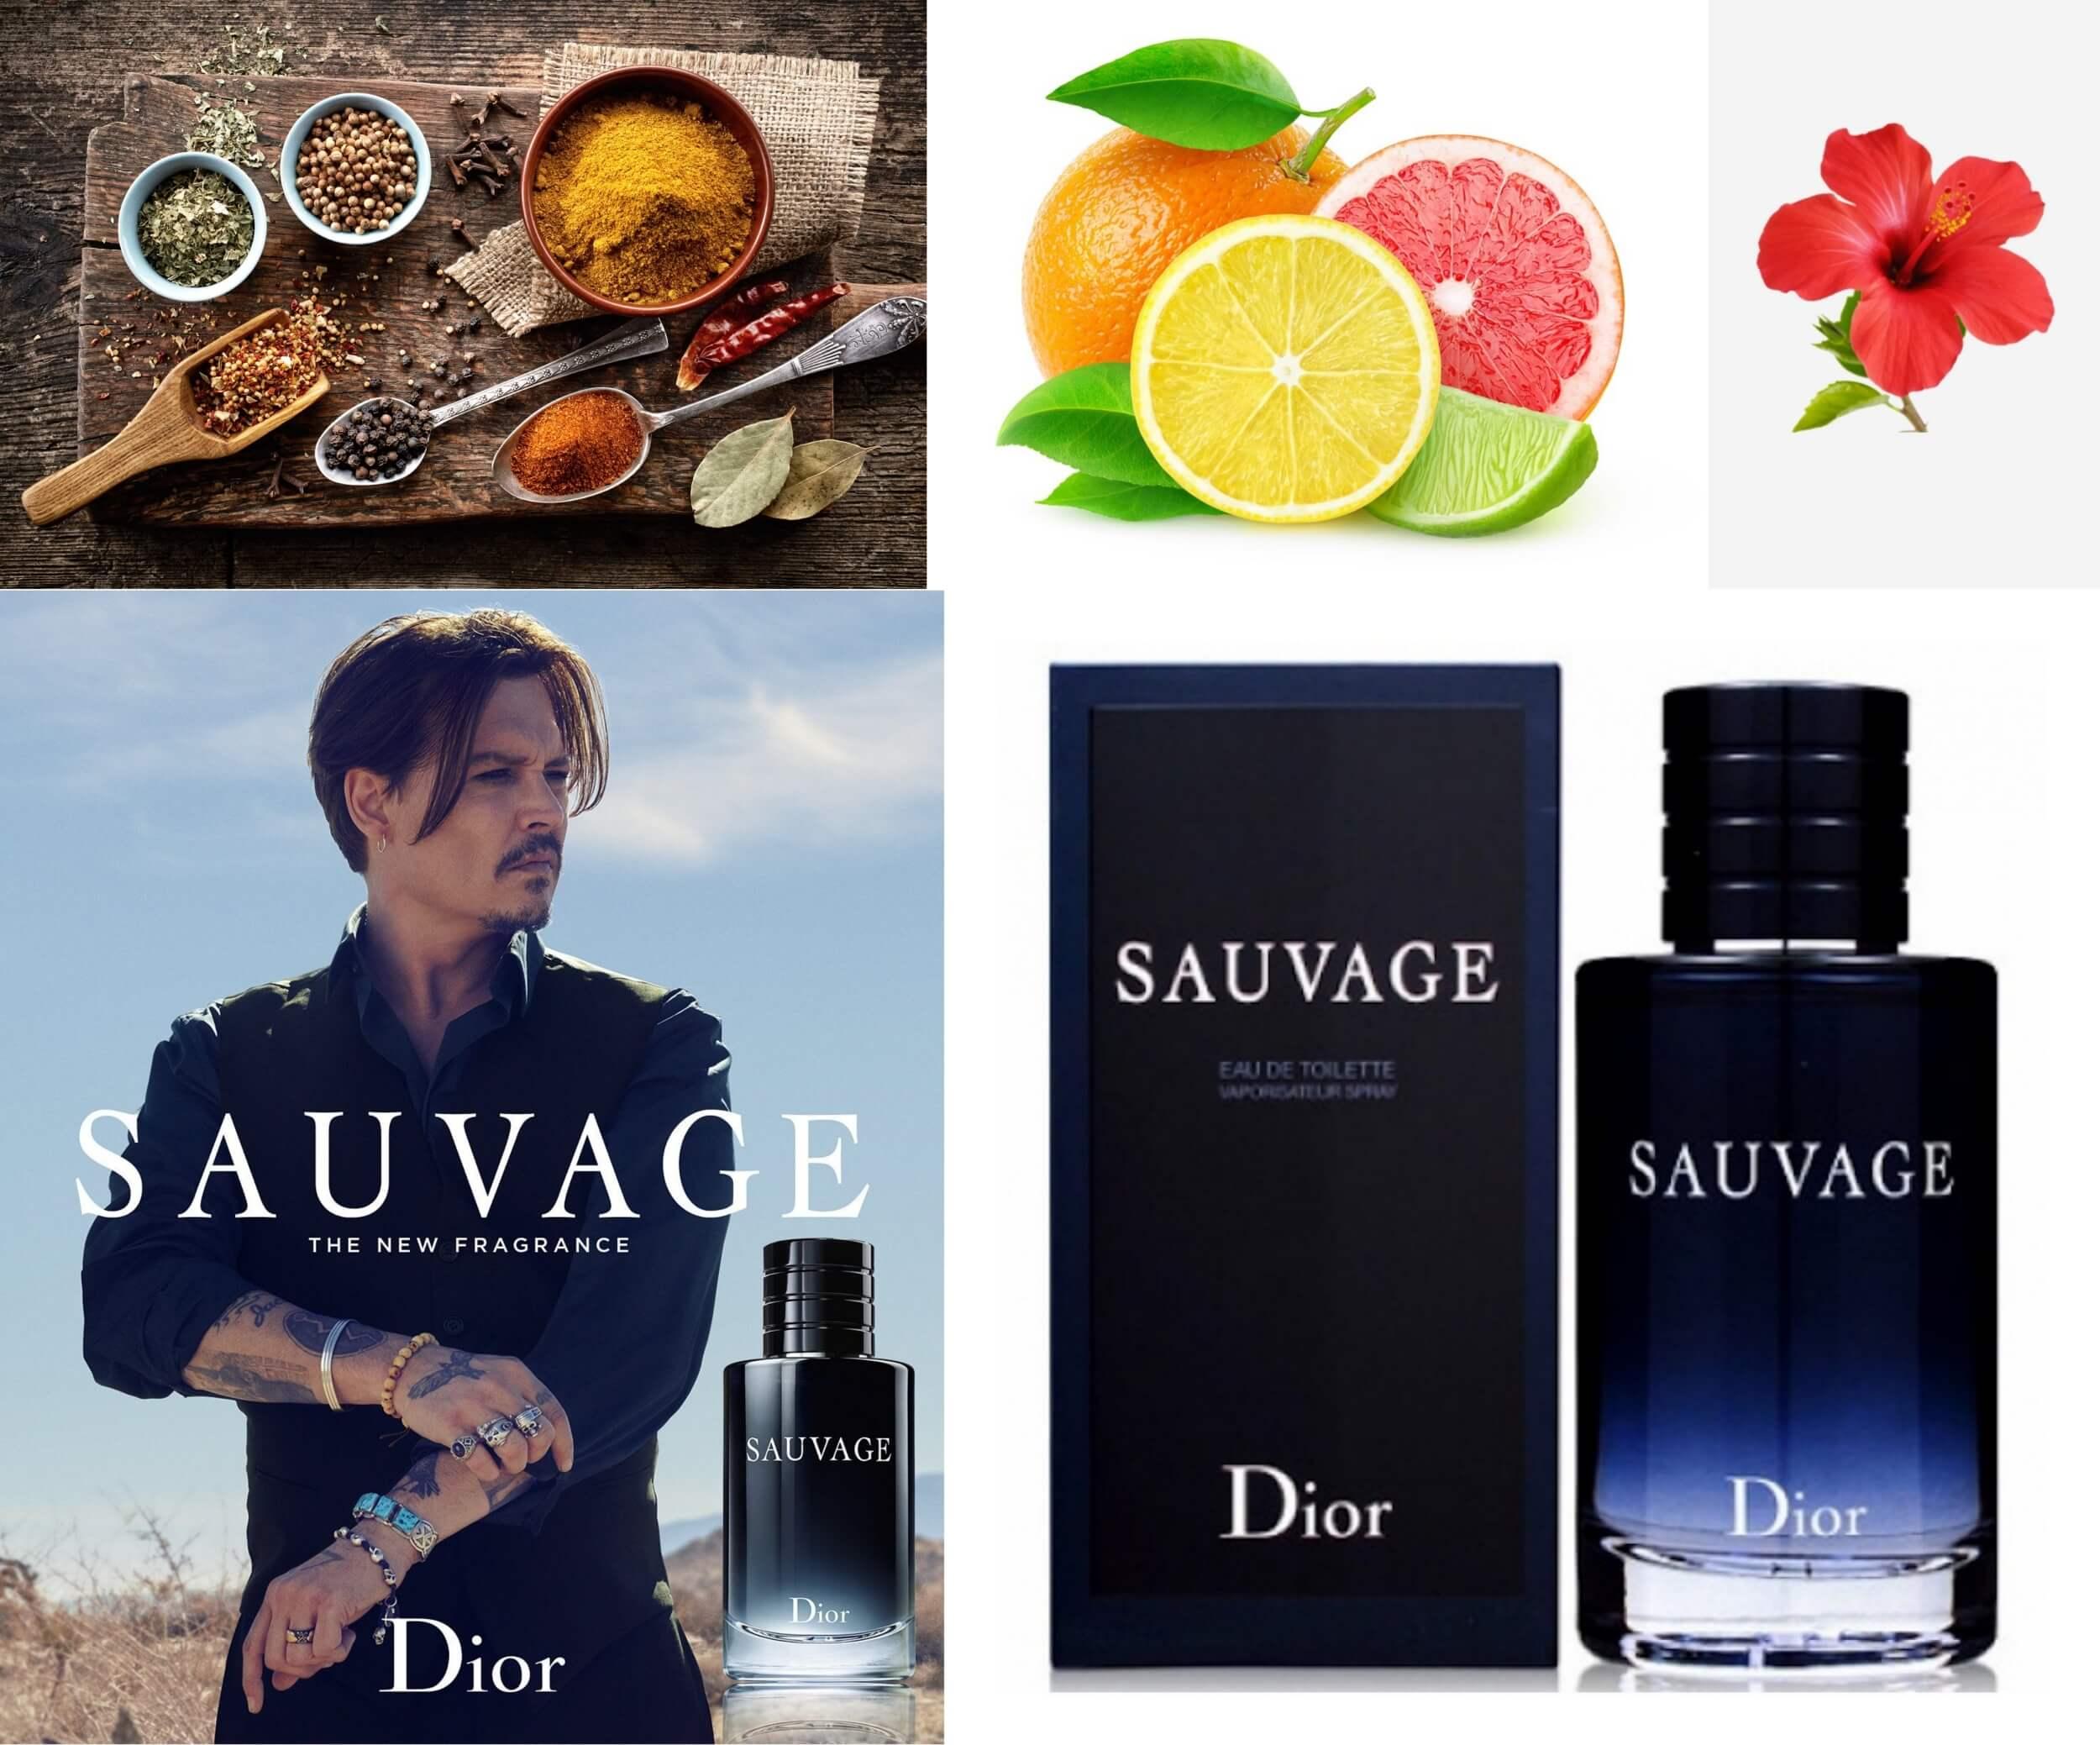 Christian Dior Suavage